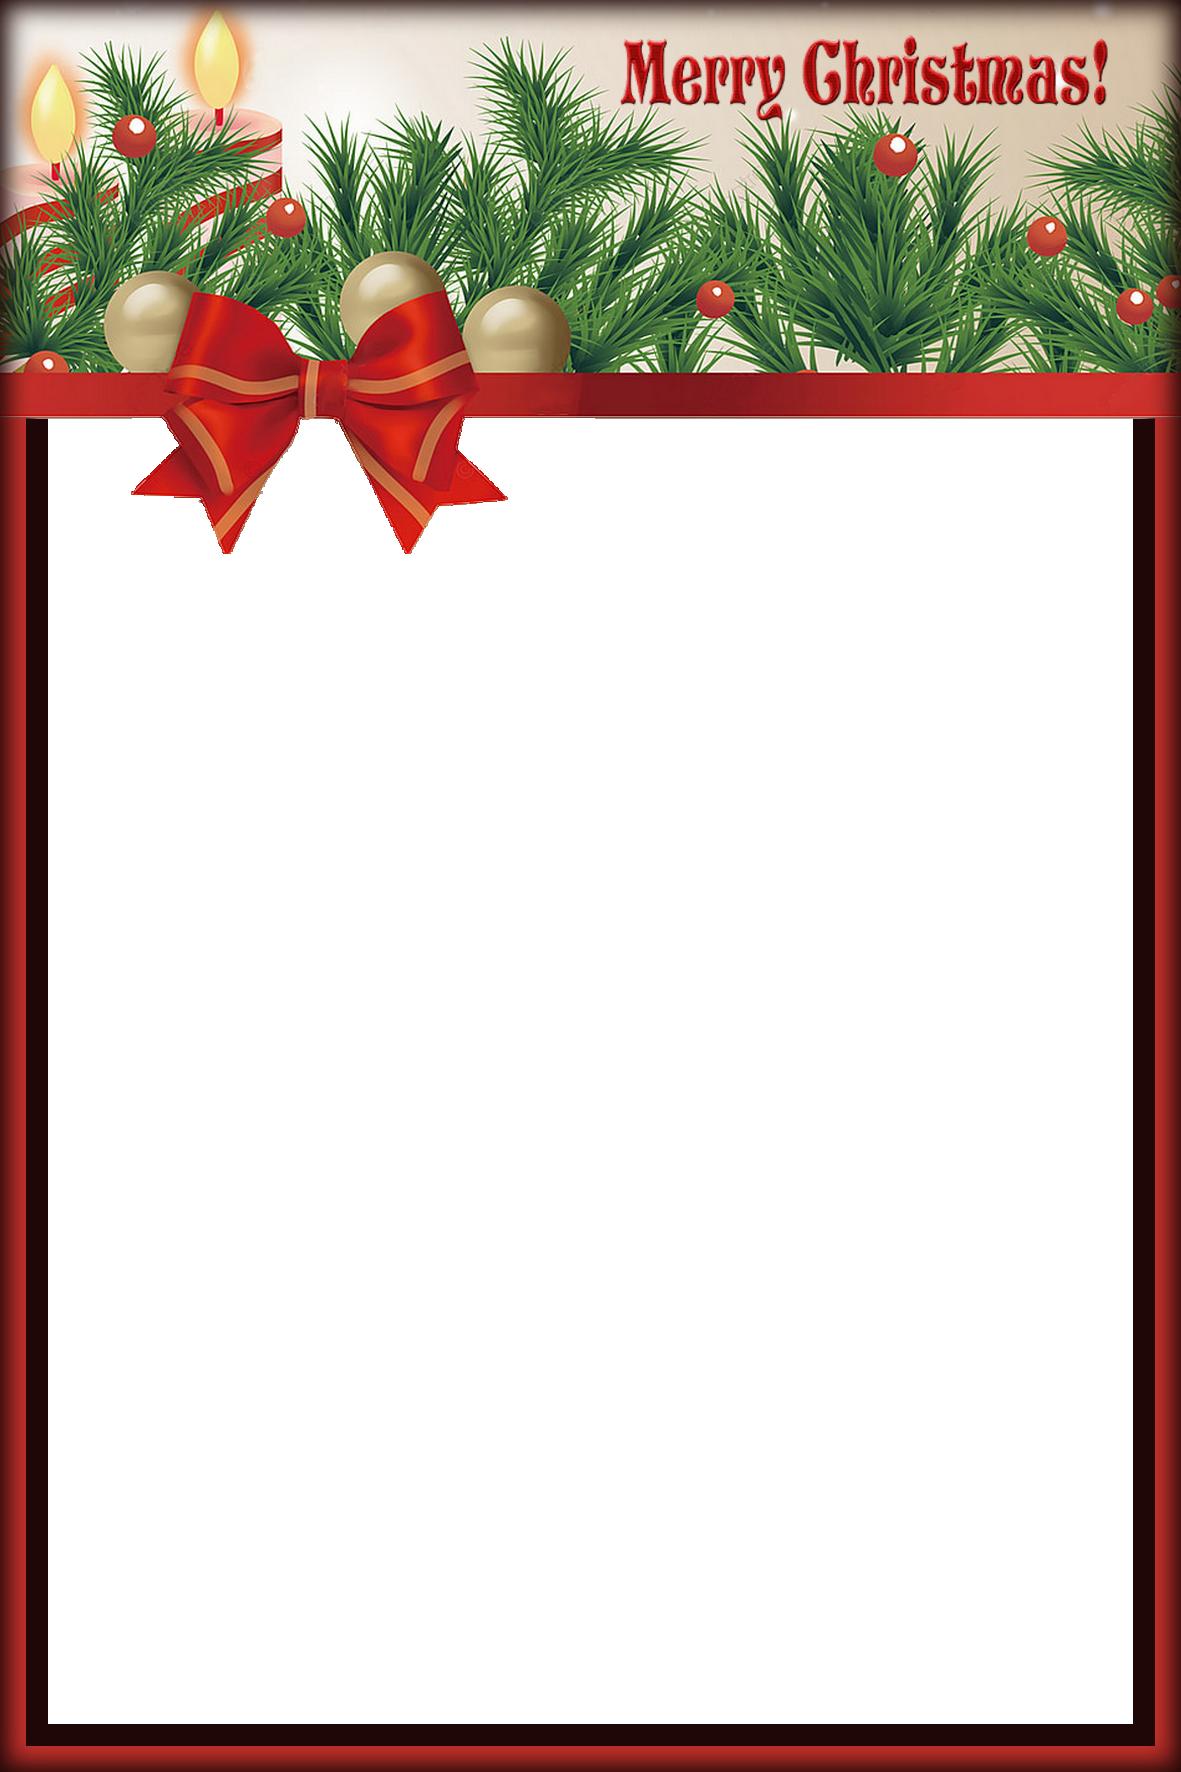 Merry Christmas Frame Png Merry Christmas Frame Christmas Frames Holiday Decor